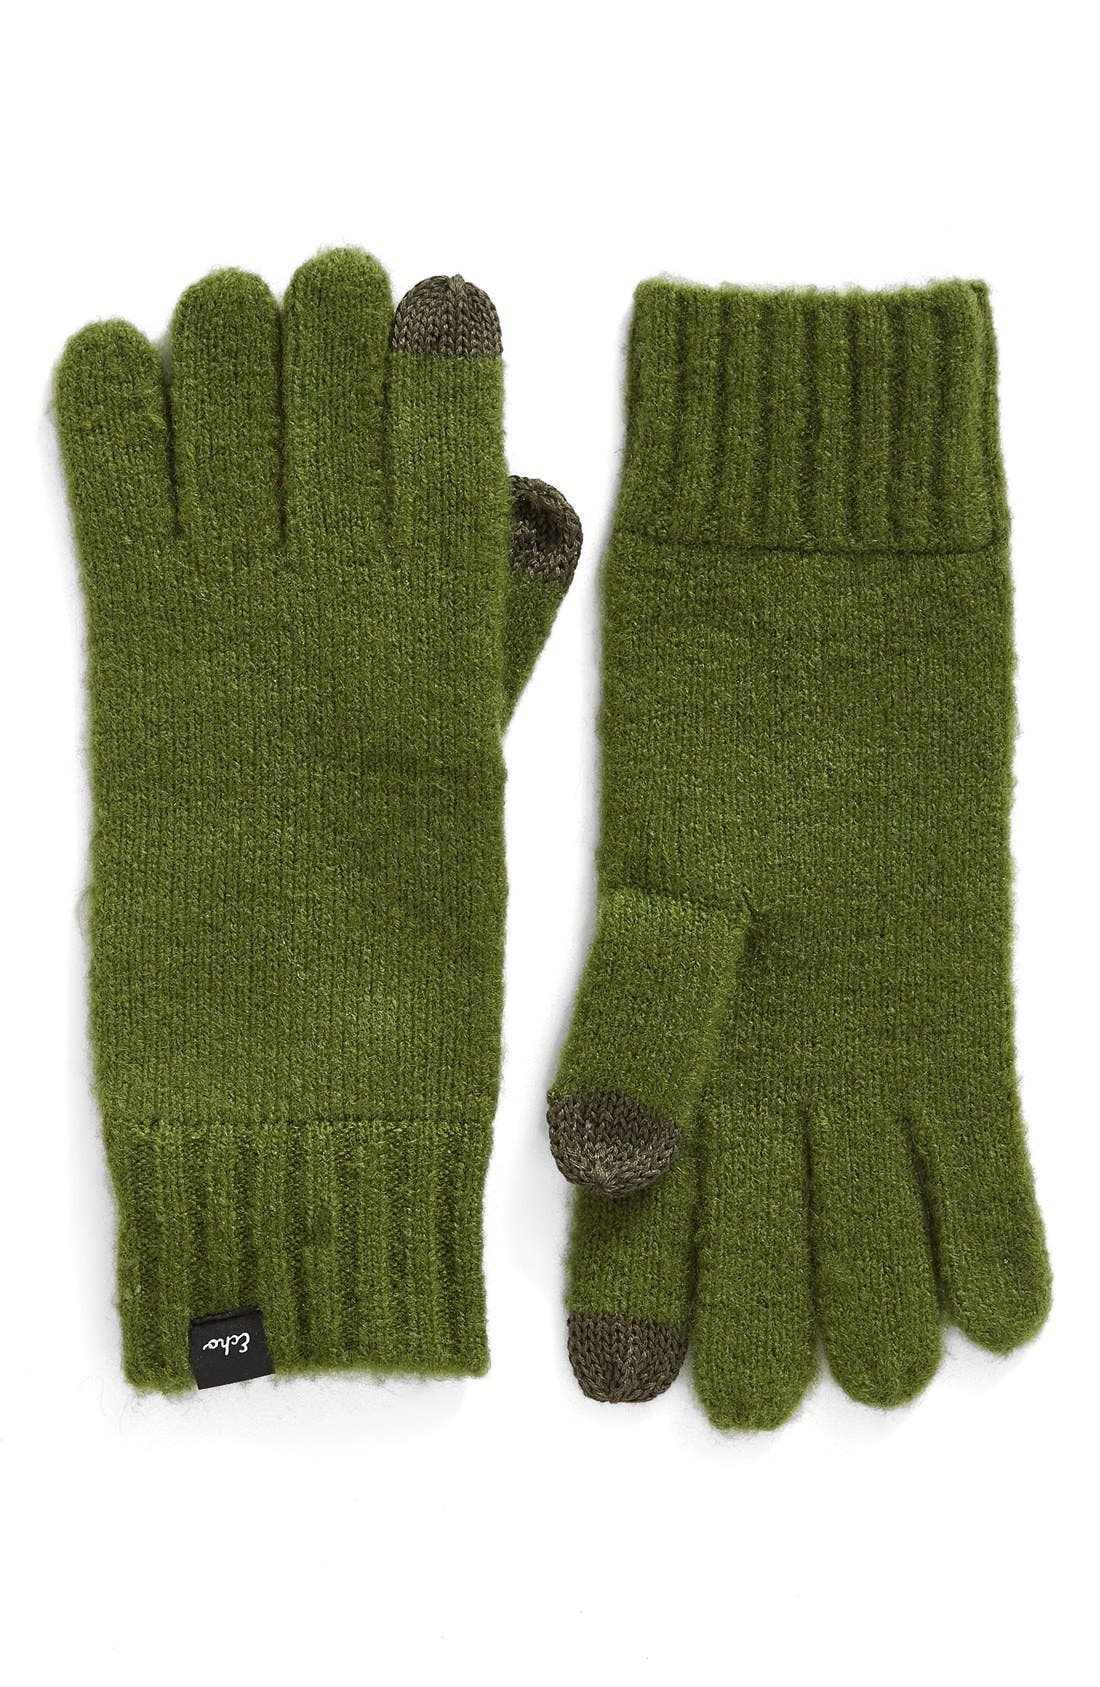 Main Image - Echo 'Touch' Stretch Fleece Tech Gloves